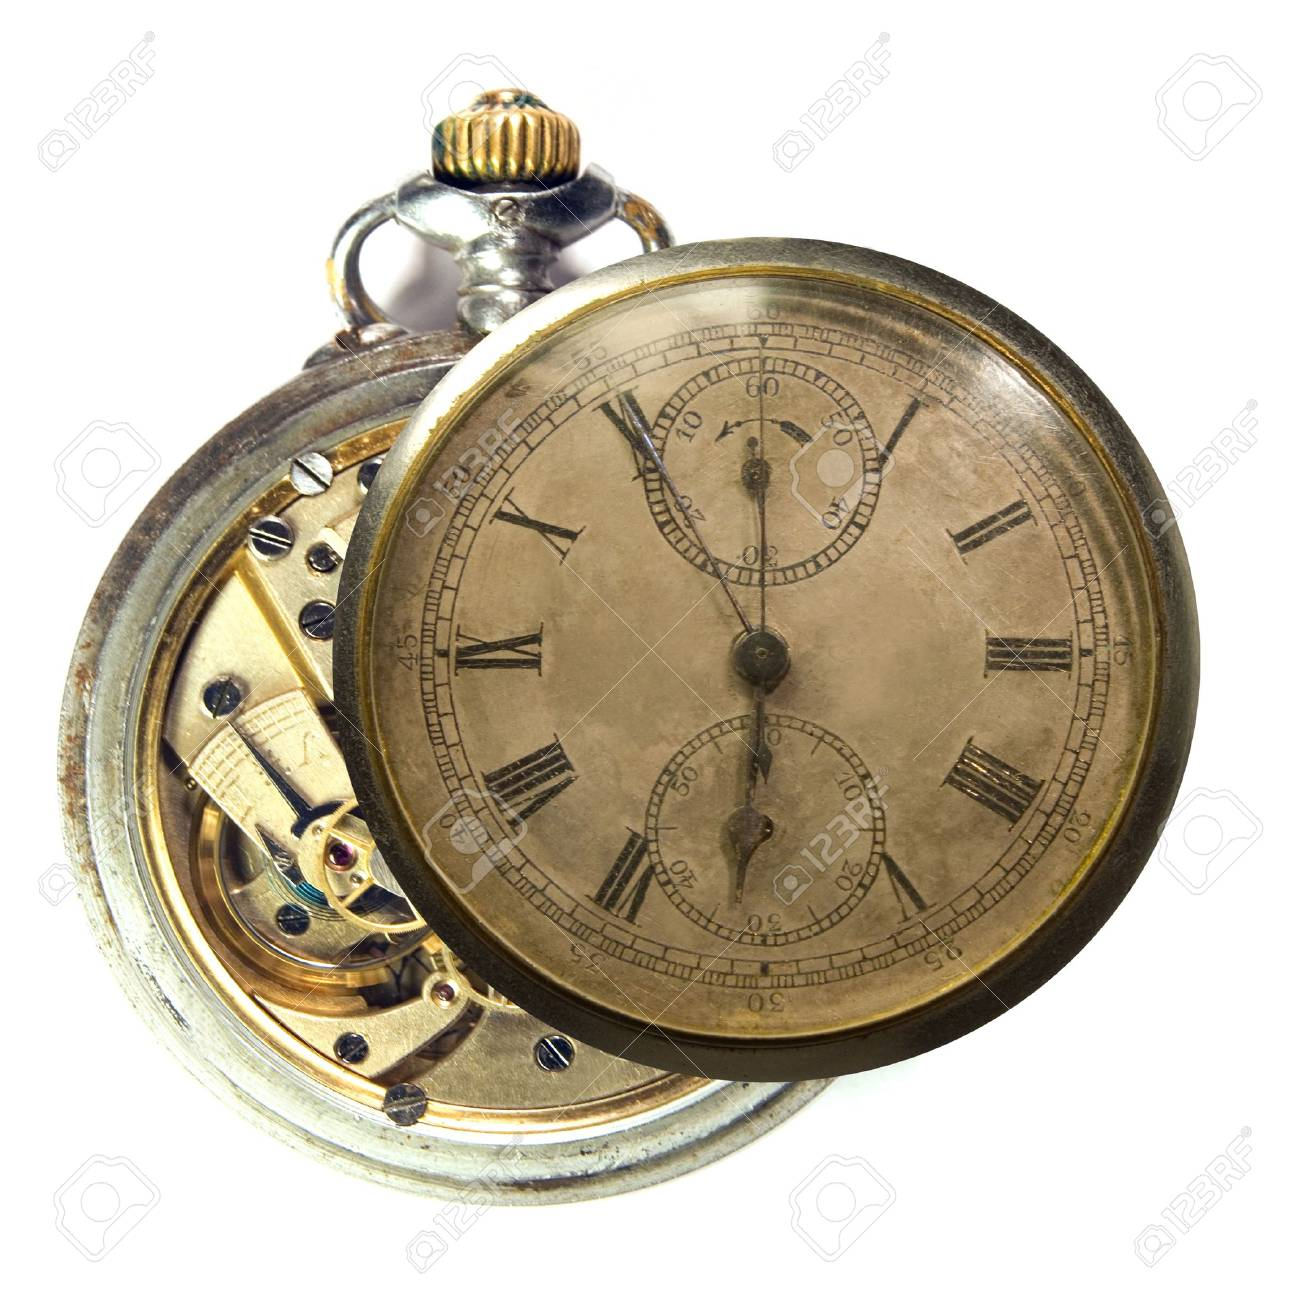 Clock-work. Old watch. - 1729557